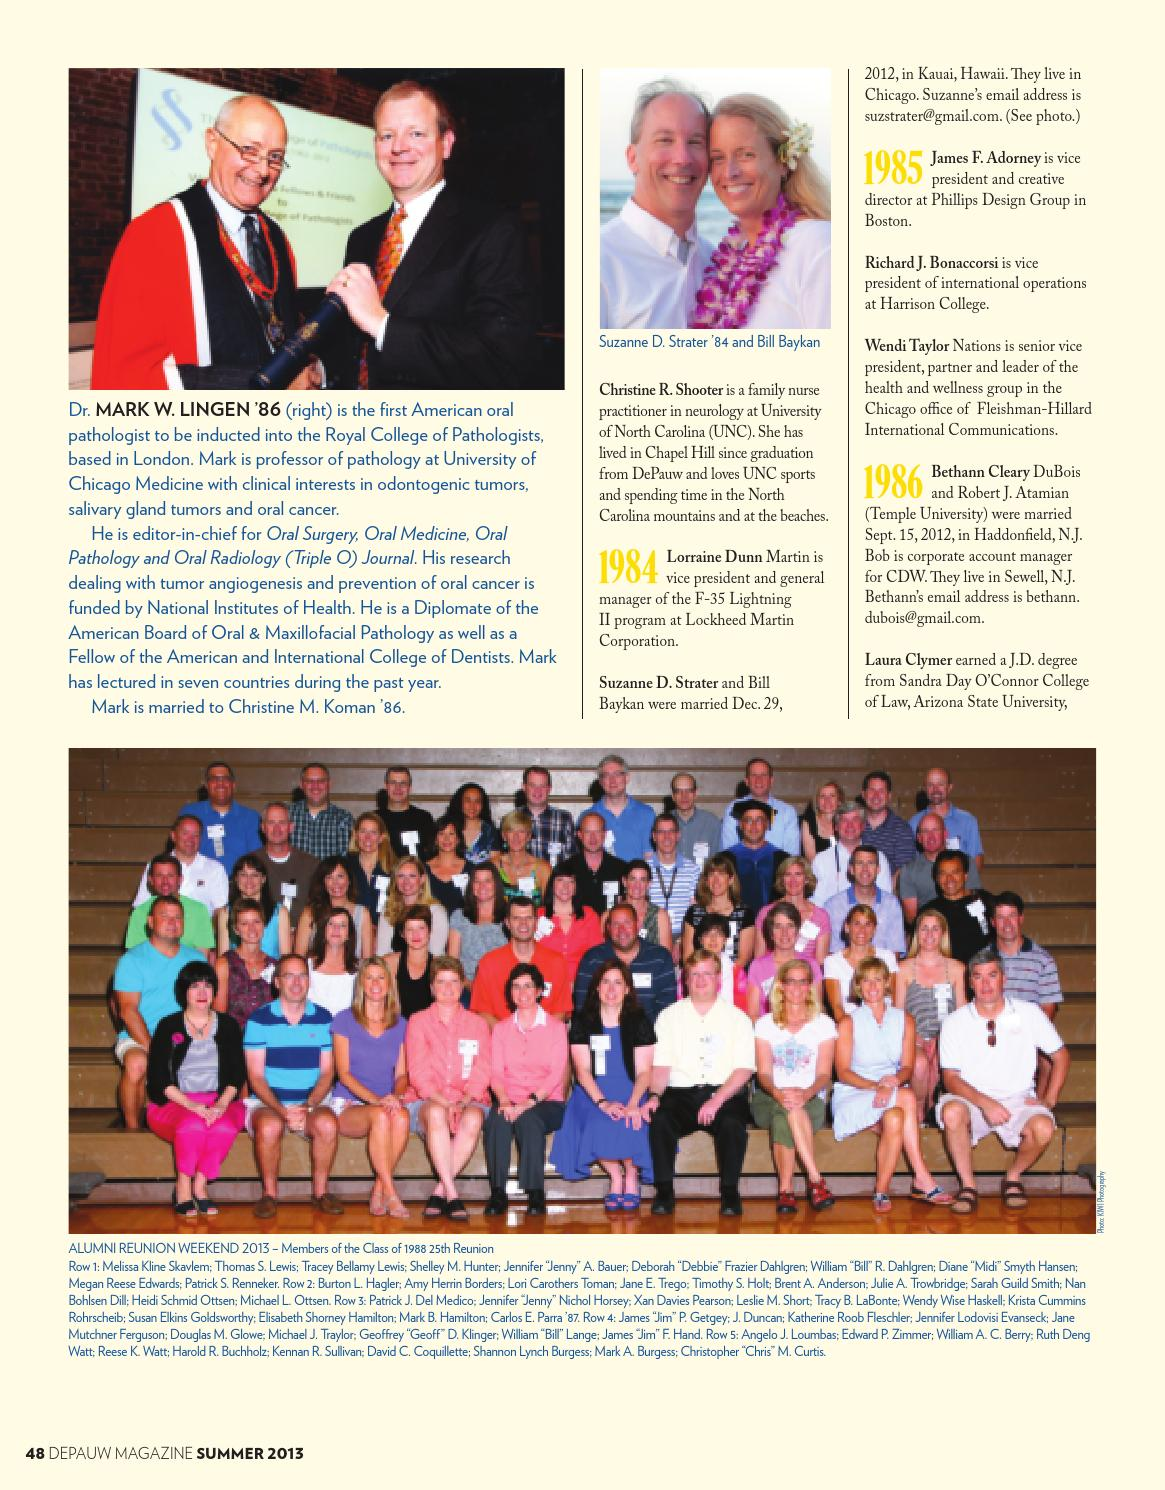 DePauw Magazine Summer 2013 by DePauw University Publications - issuu